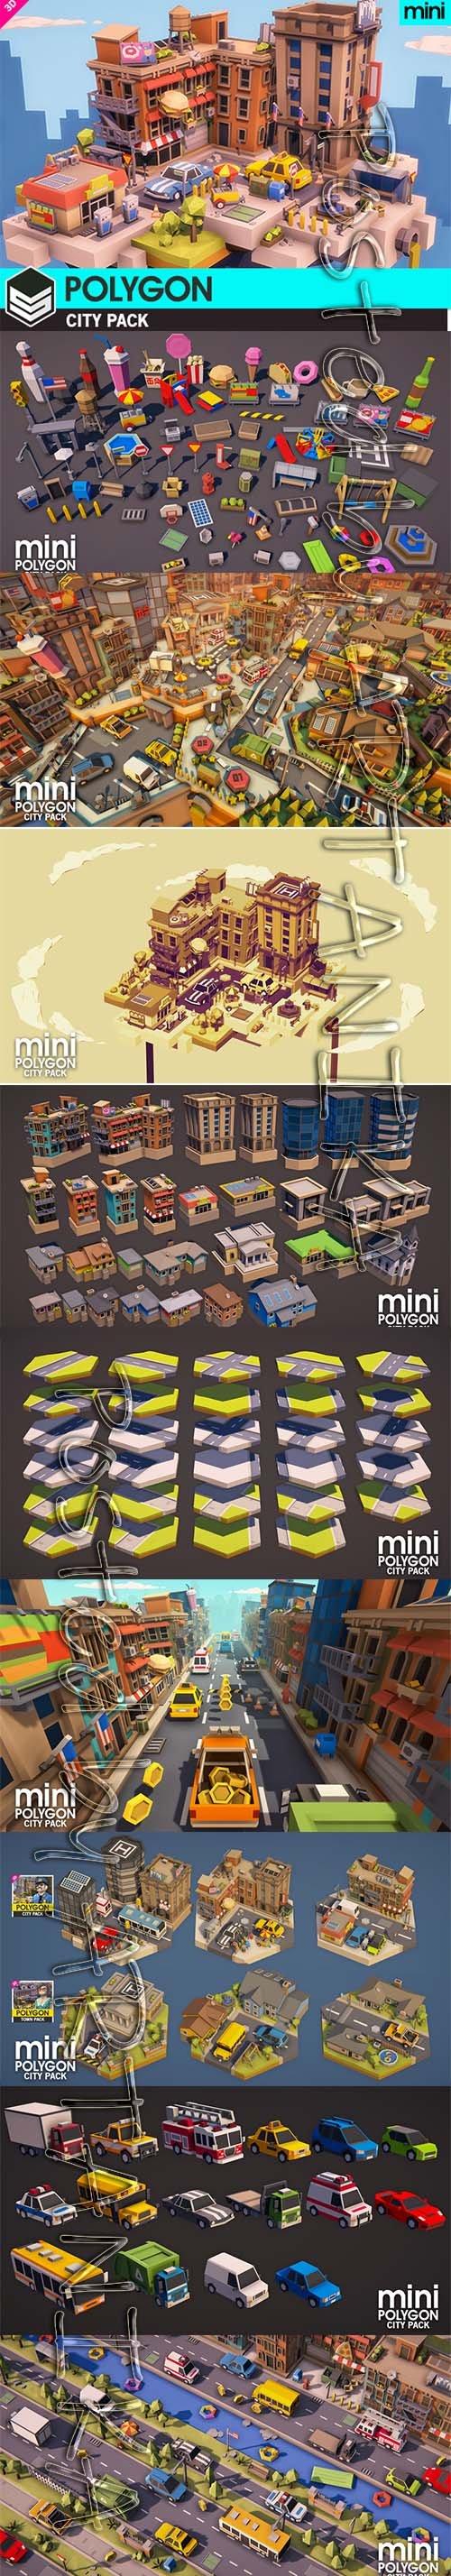 POLYGON MINI - City Pack v1.01